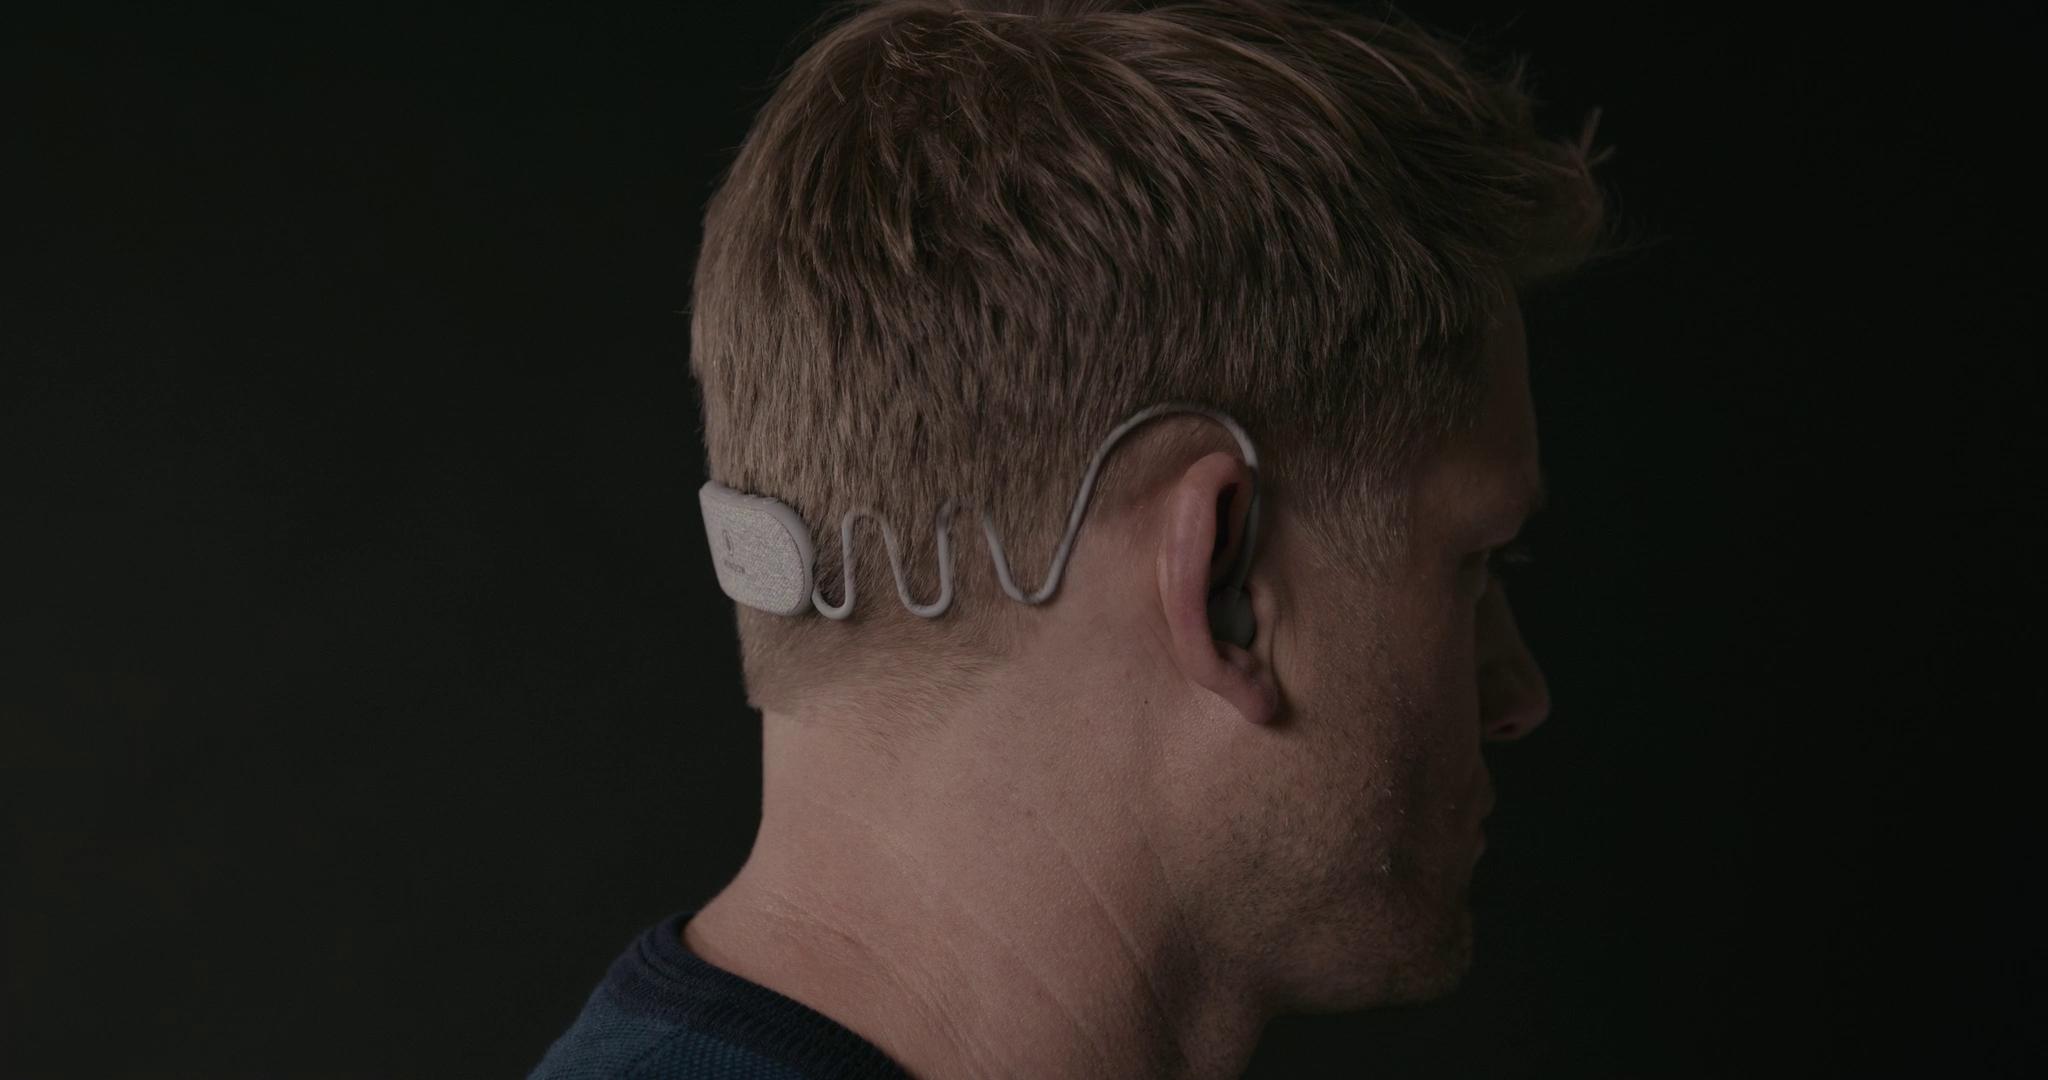 NightBuds Smart Earbuds